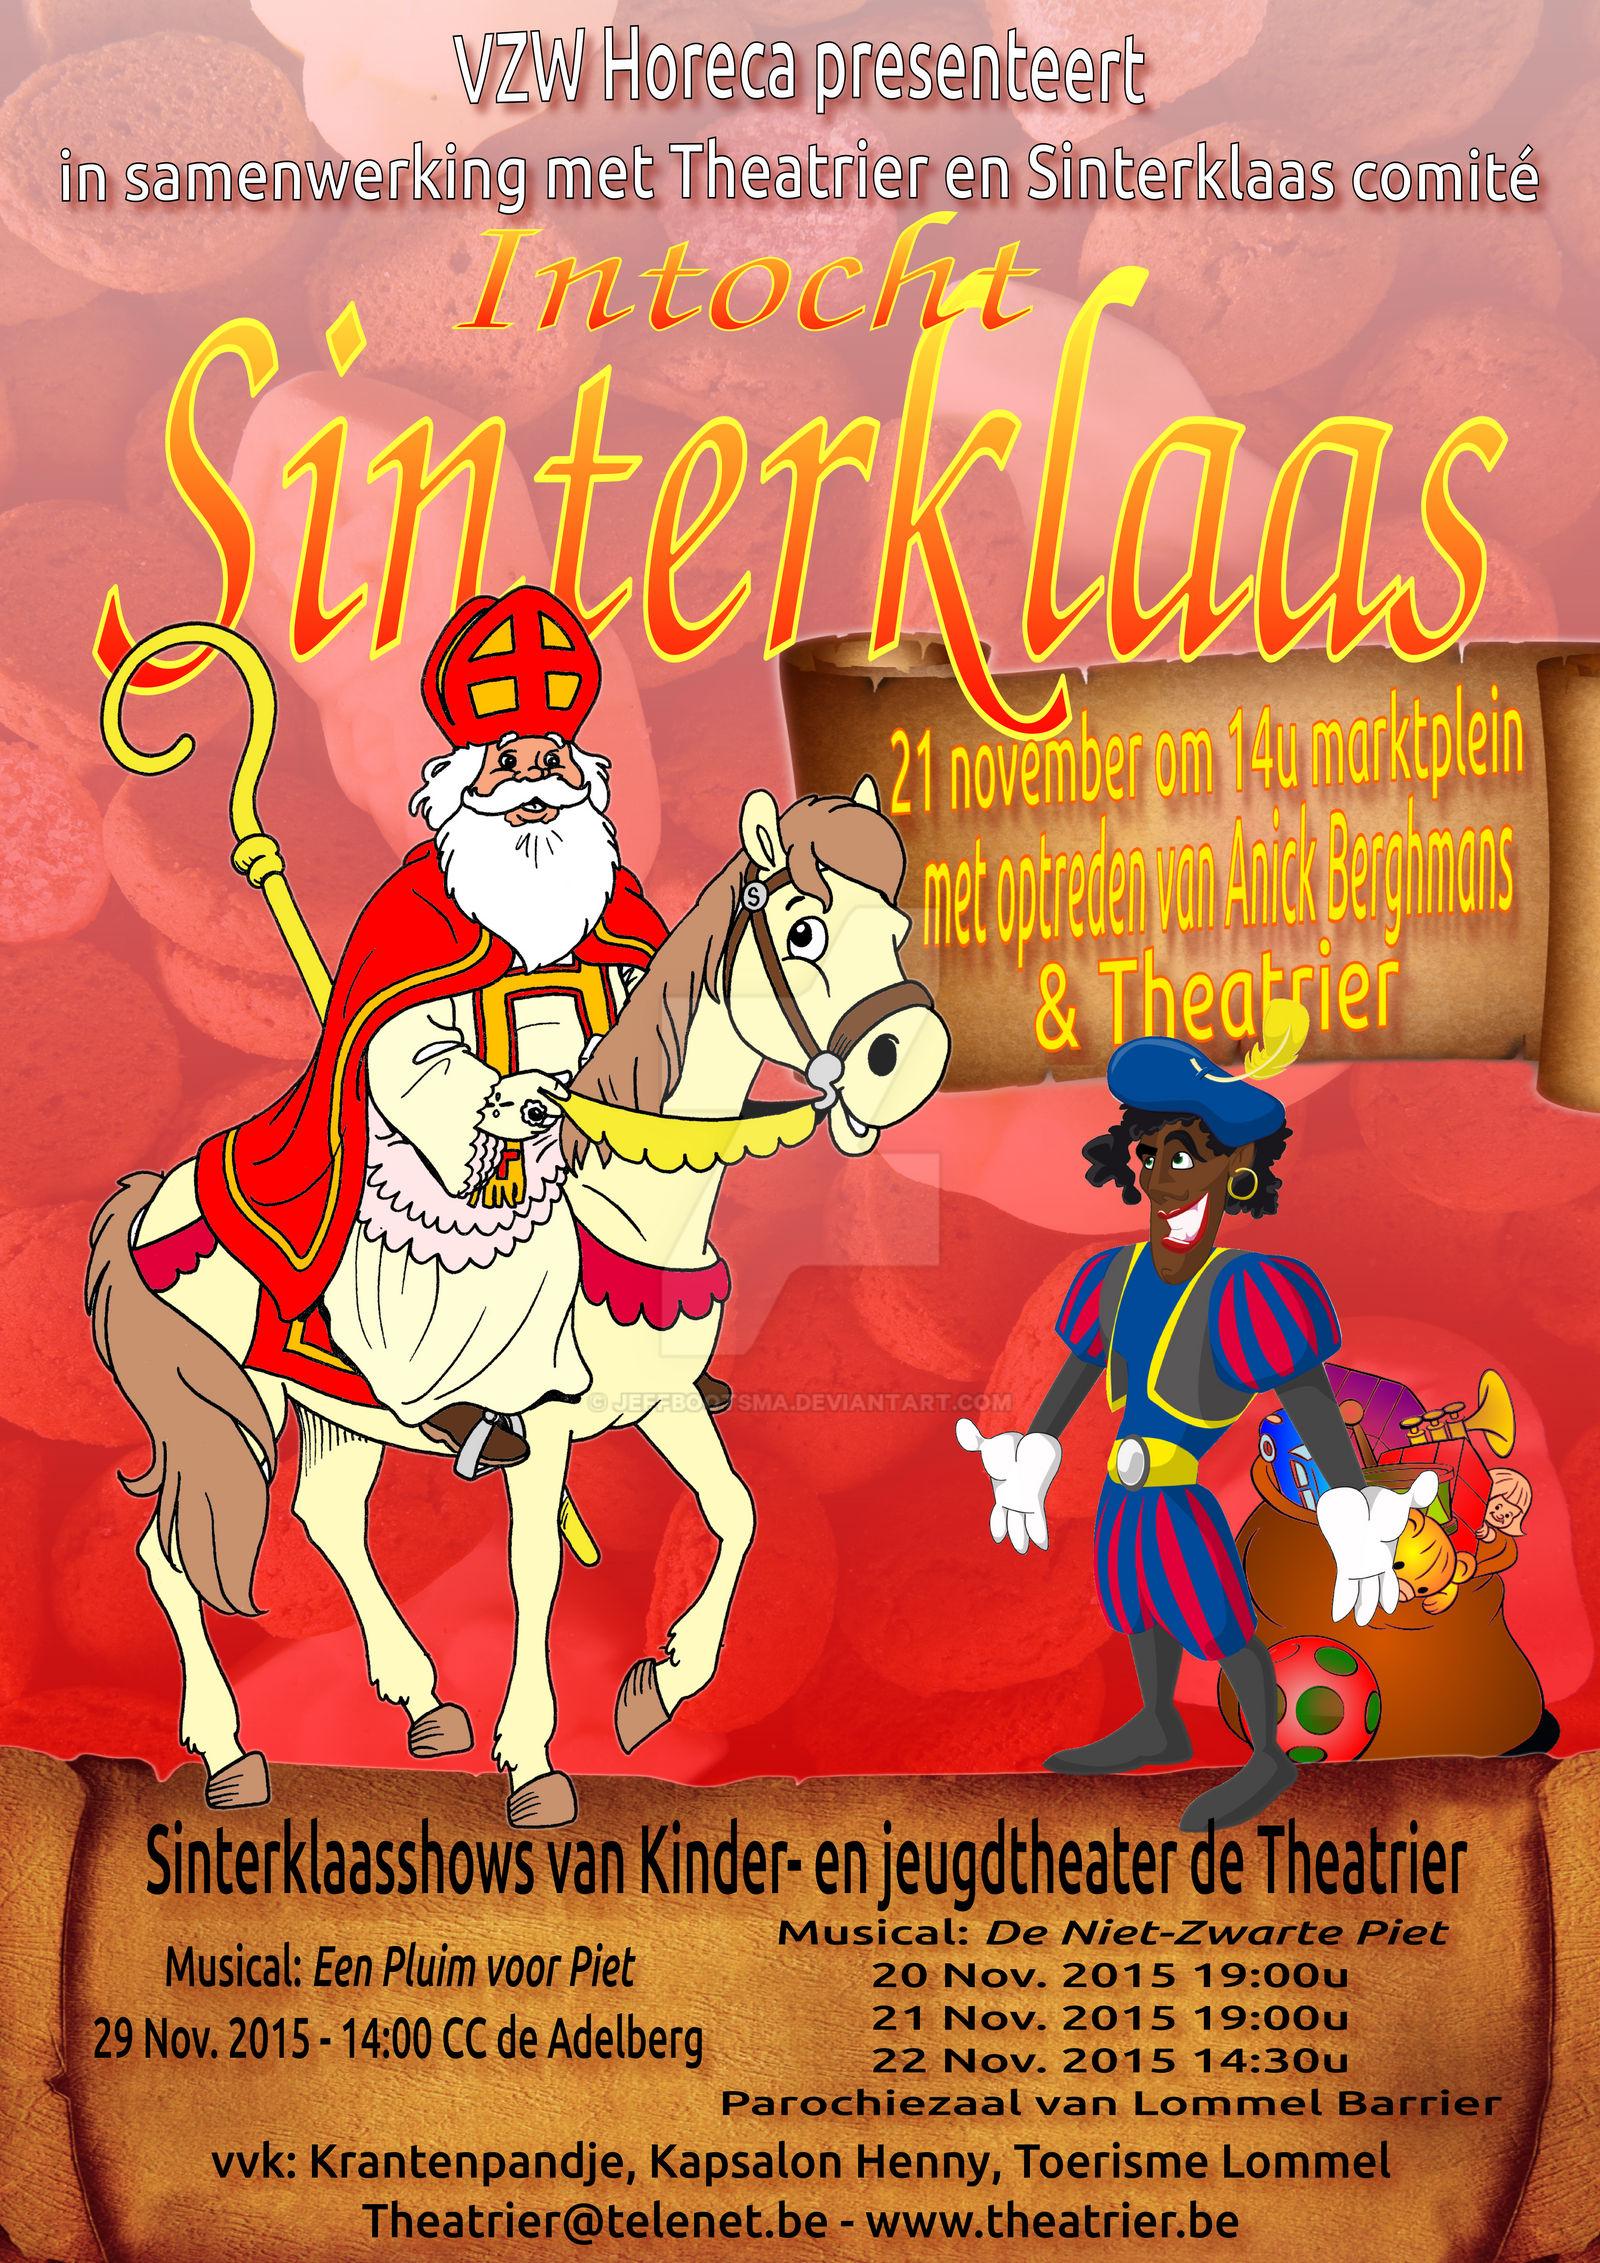 Sinterklaas Poster Design By Jeffbootsma On Deviantart